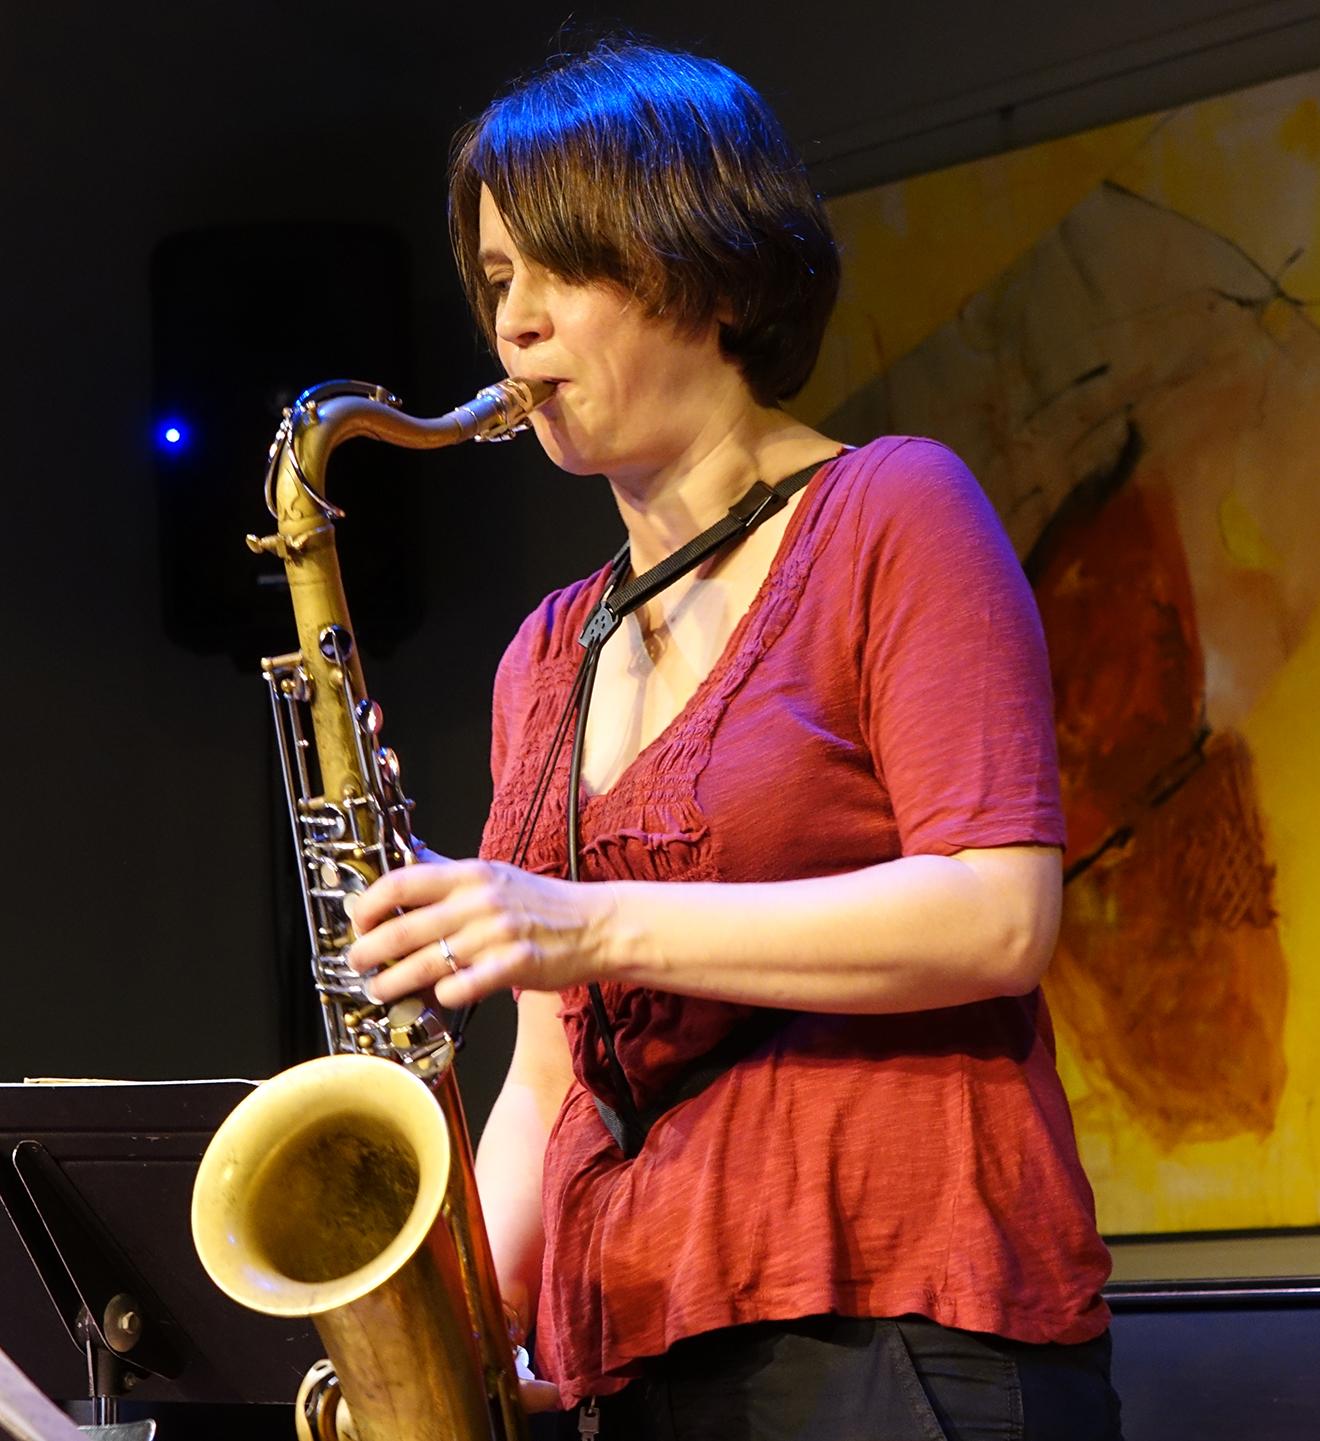 Ingrid Laubrock at Edgefest 2015